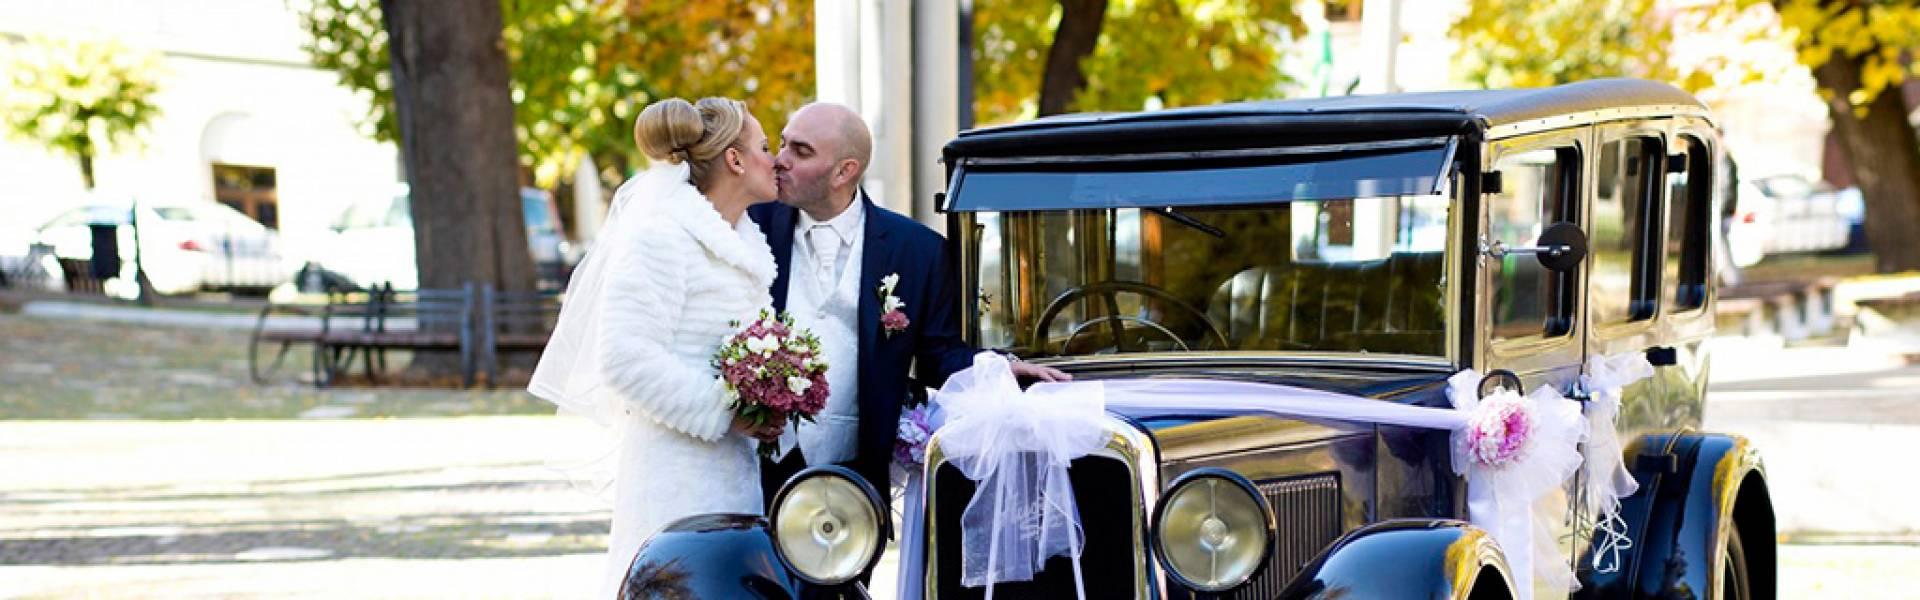 brudekørsel sjælland